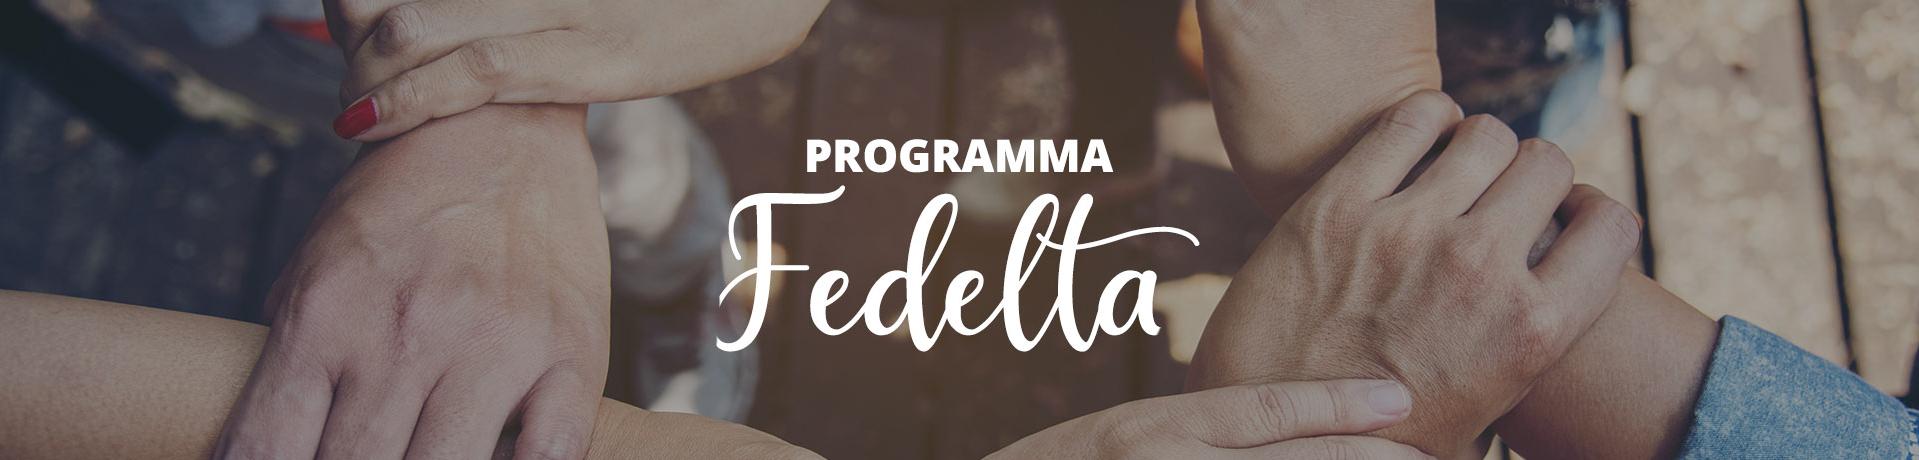 Programma fedeltà